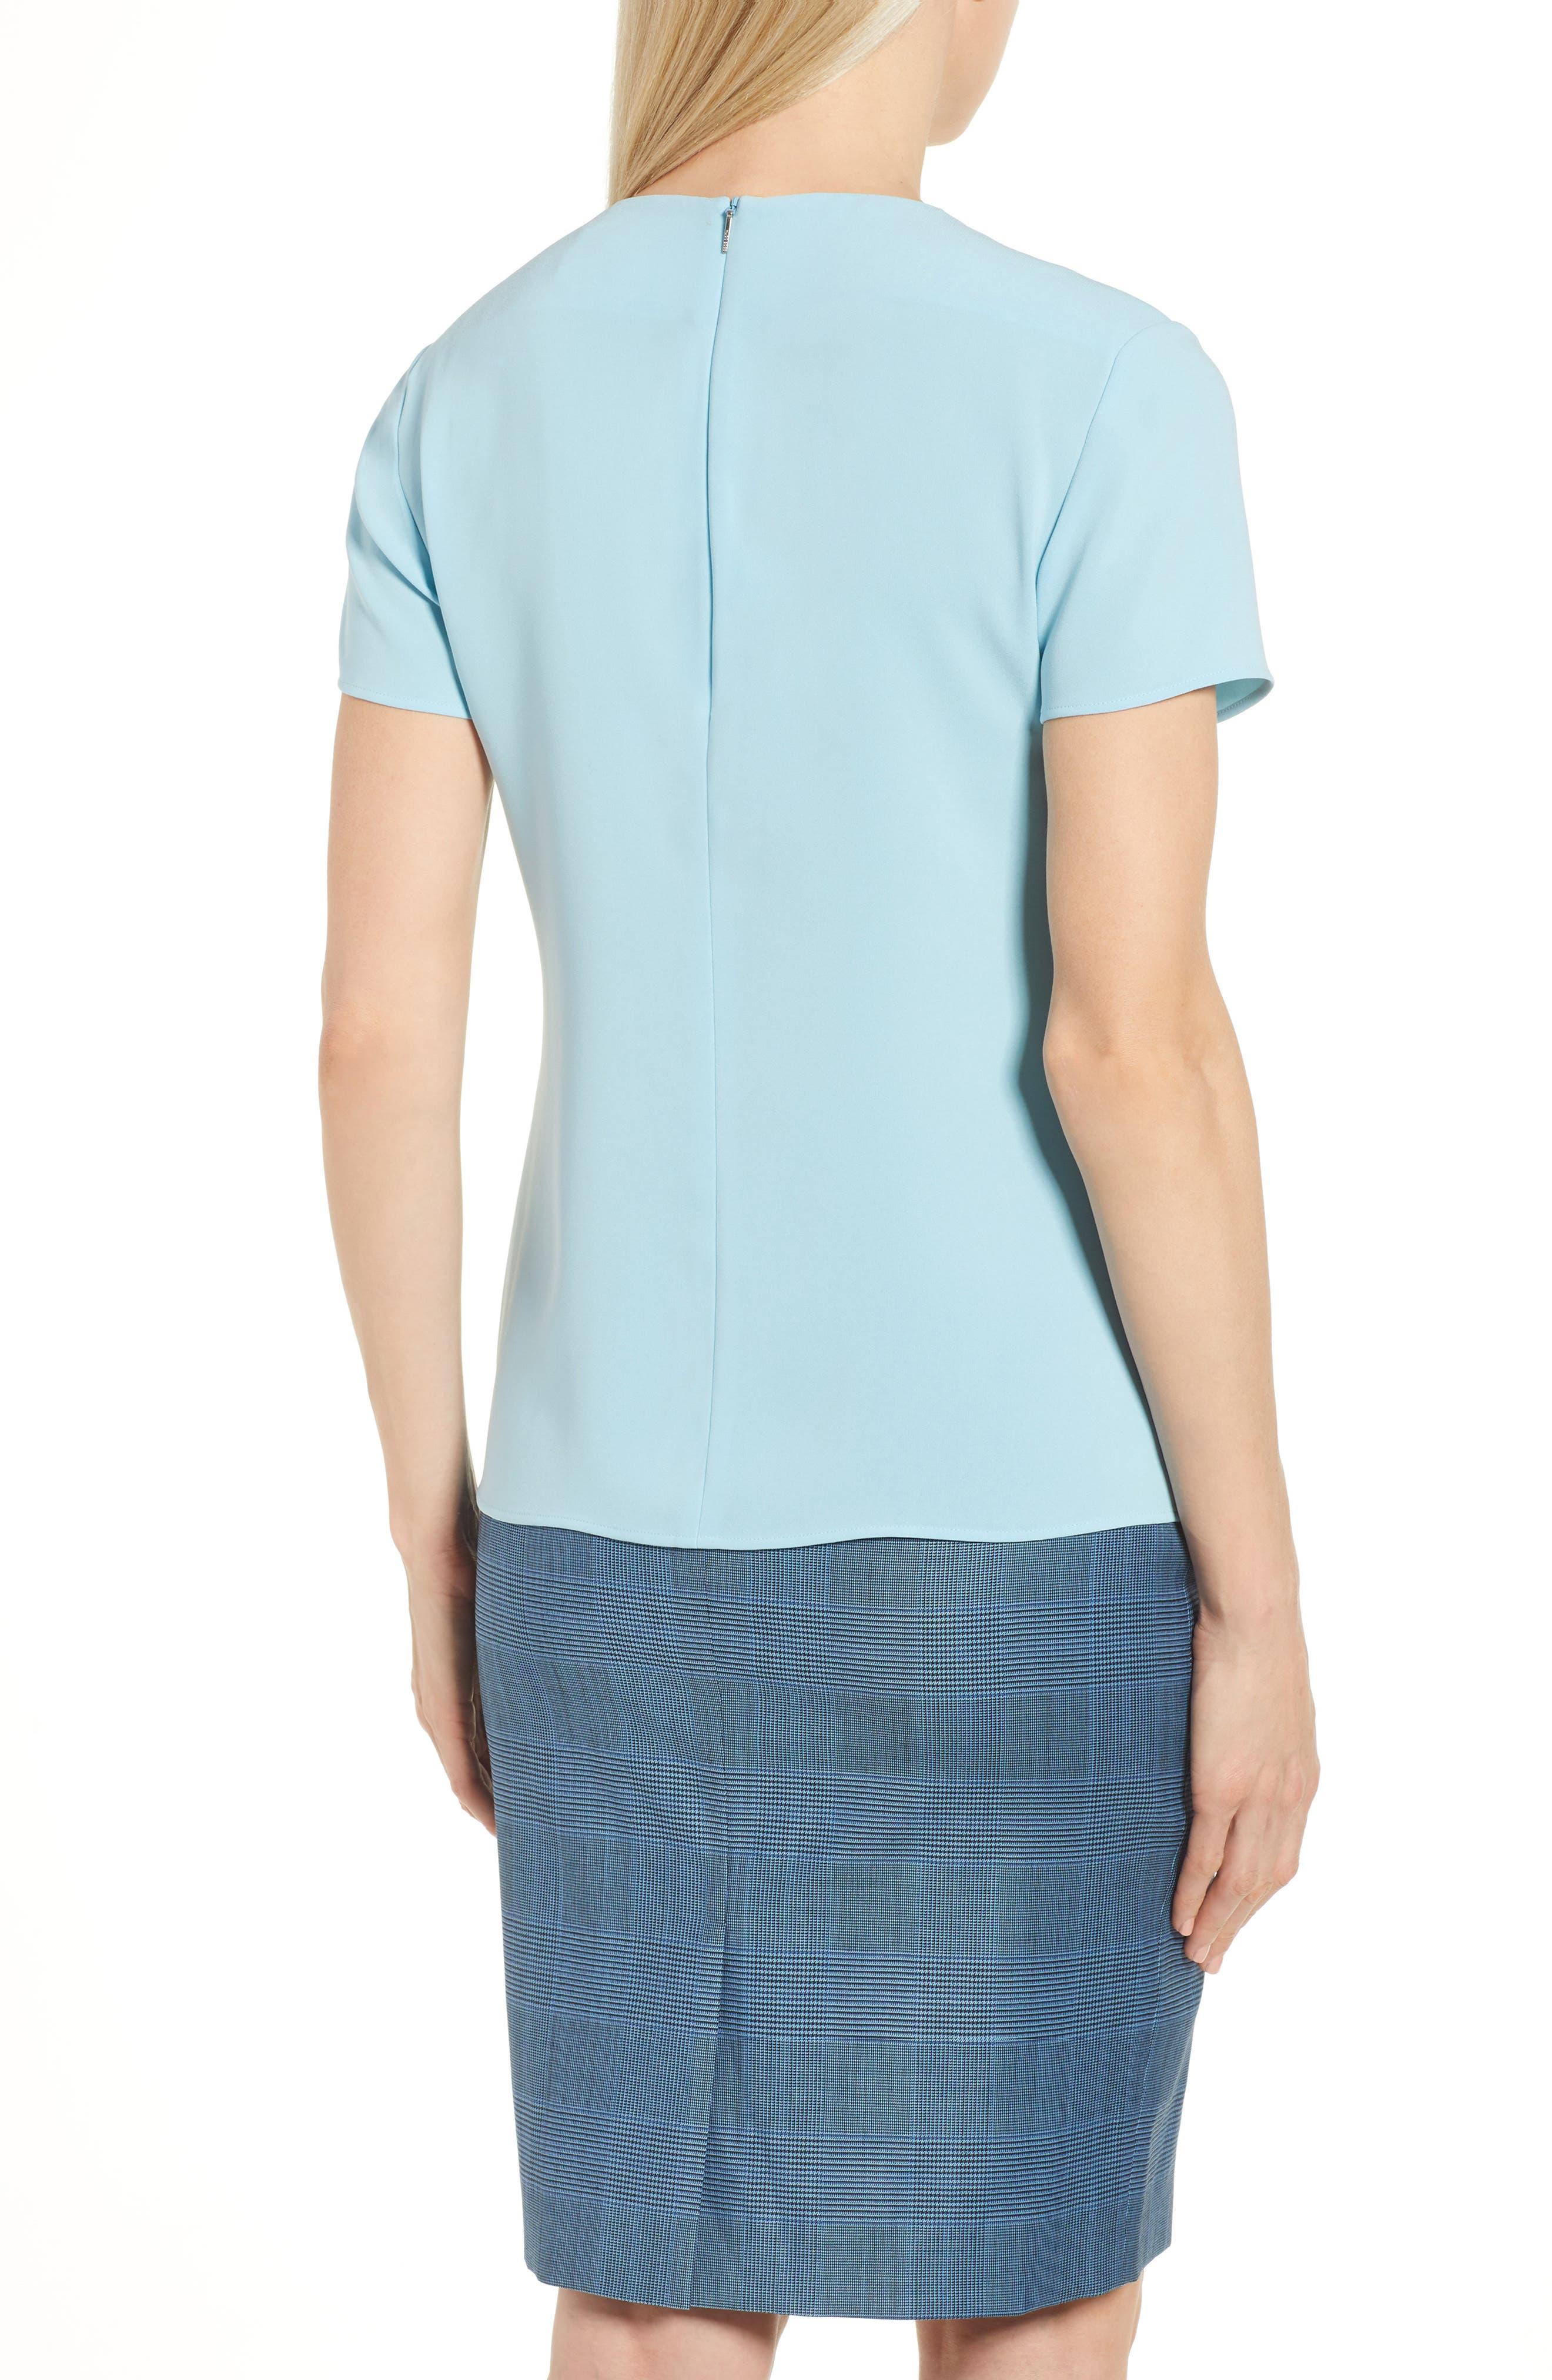 Ilyna Crepe Short Sleeve Top,                             Alternate thumbnail 2, color,                             LAGOON BLUE